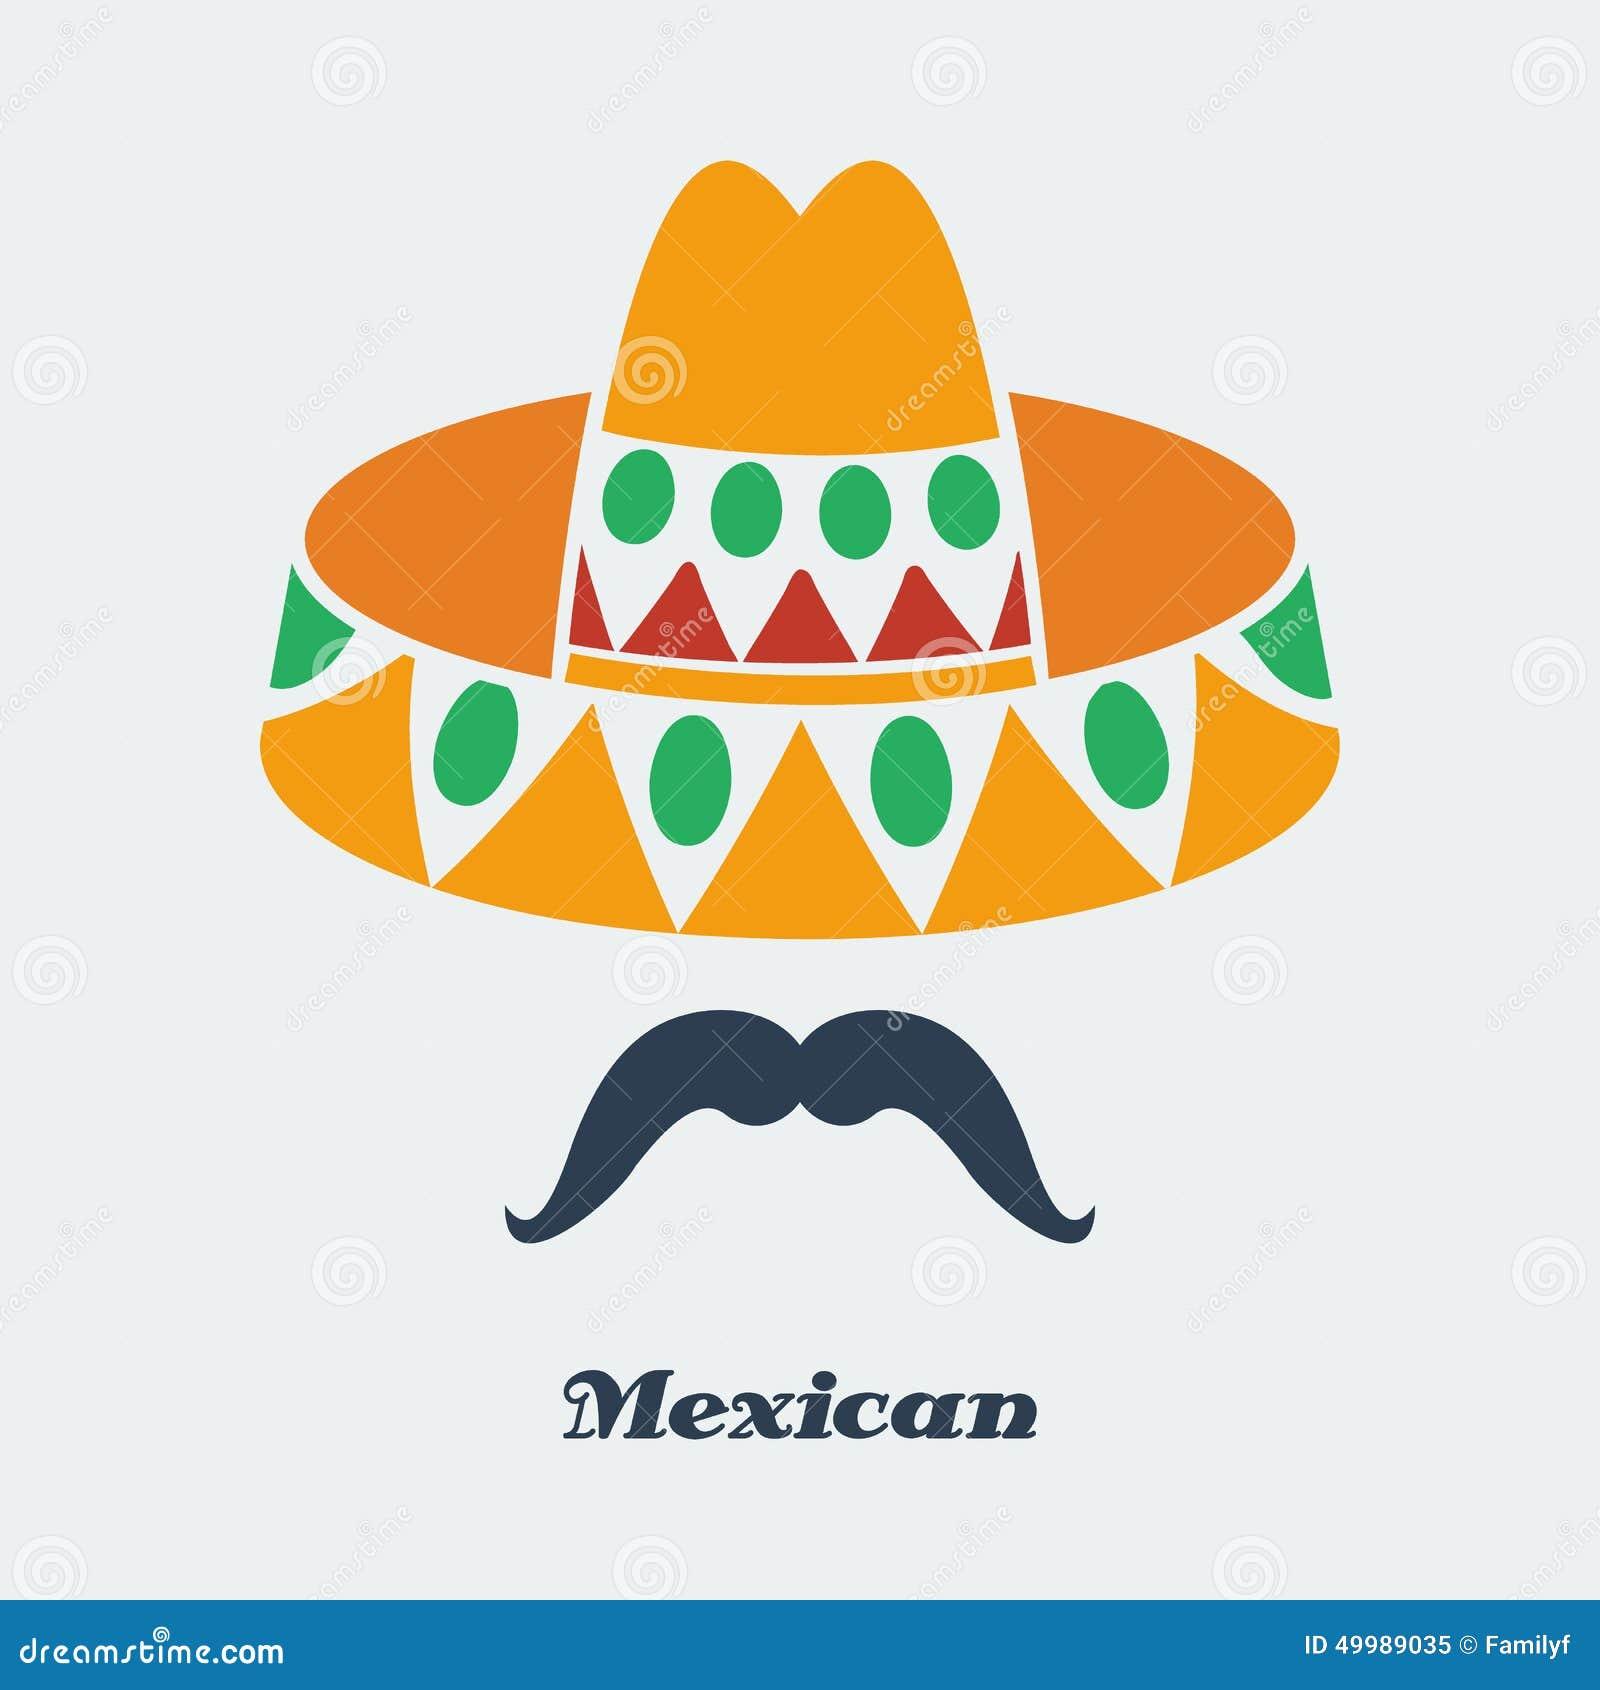 Vector Mexican Stock Vector - Image: 49989035